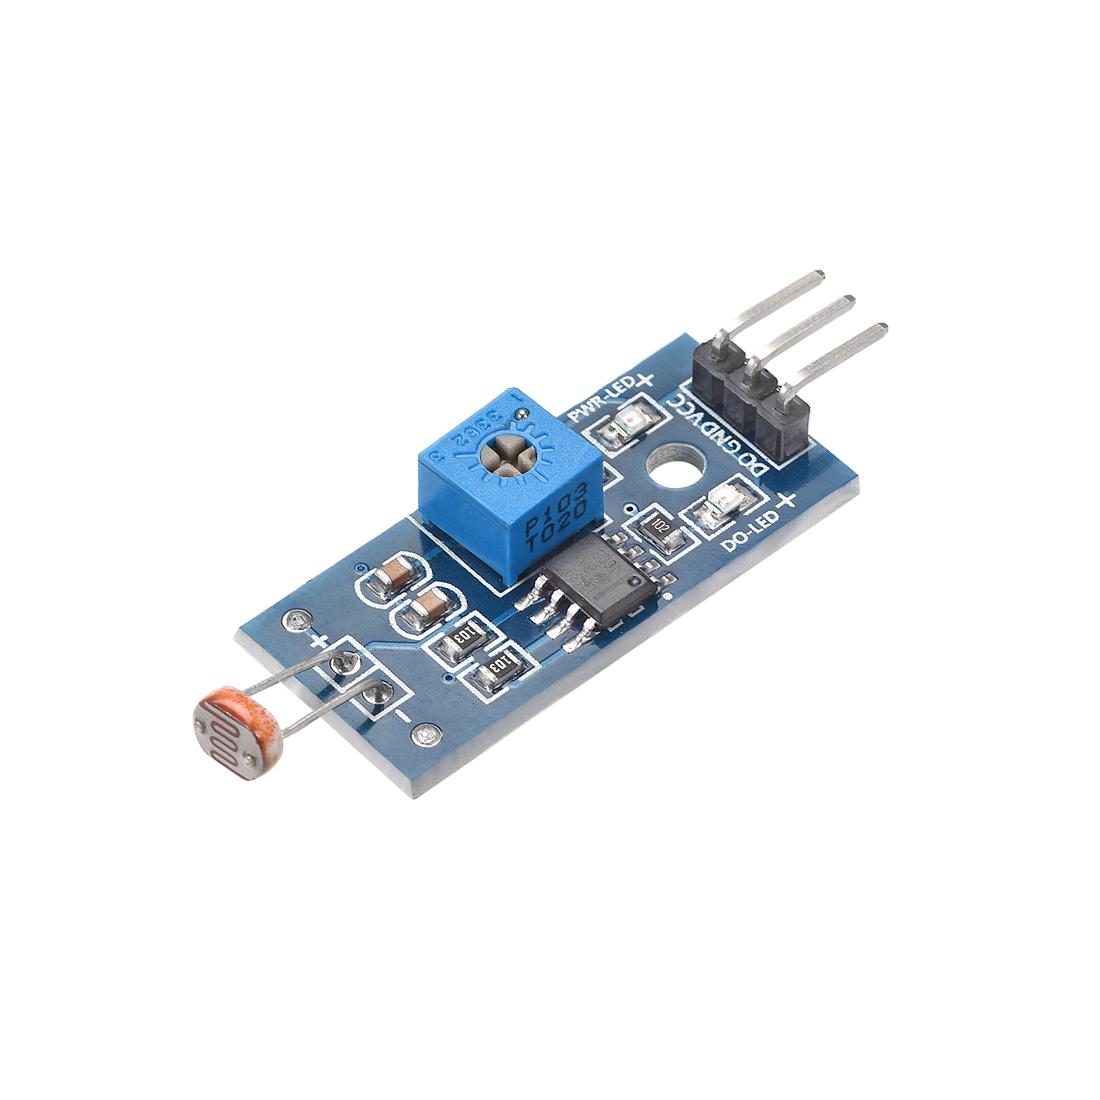 Photosensitive Sensor Module Digital Light Intensity Detection DC 3.3-5V